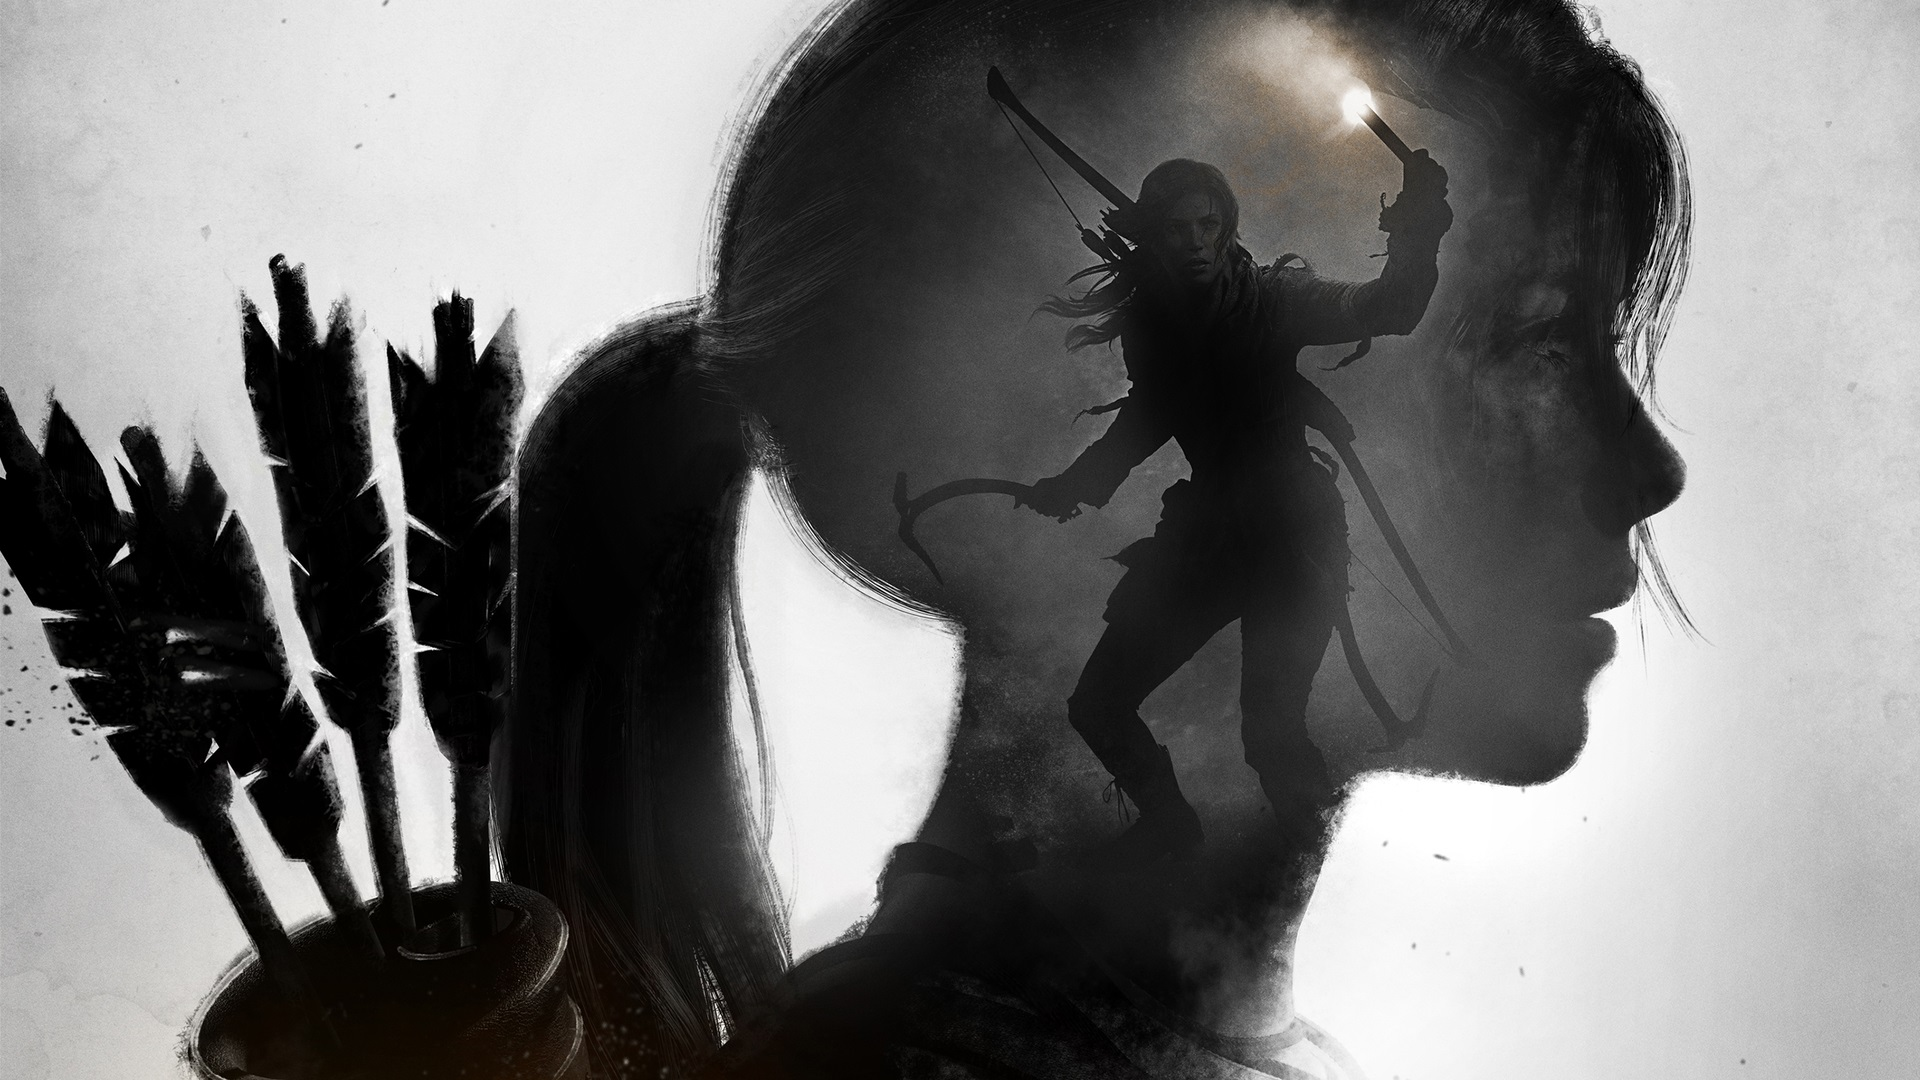 Wallpaper Rise Of The Tomb Raider Lara Croft Art Picture